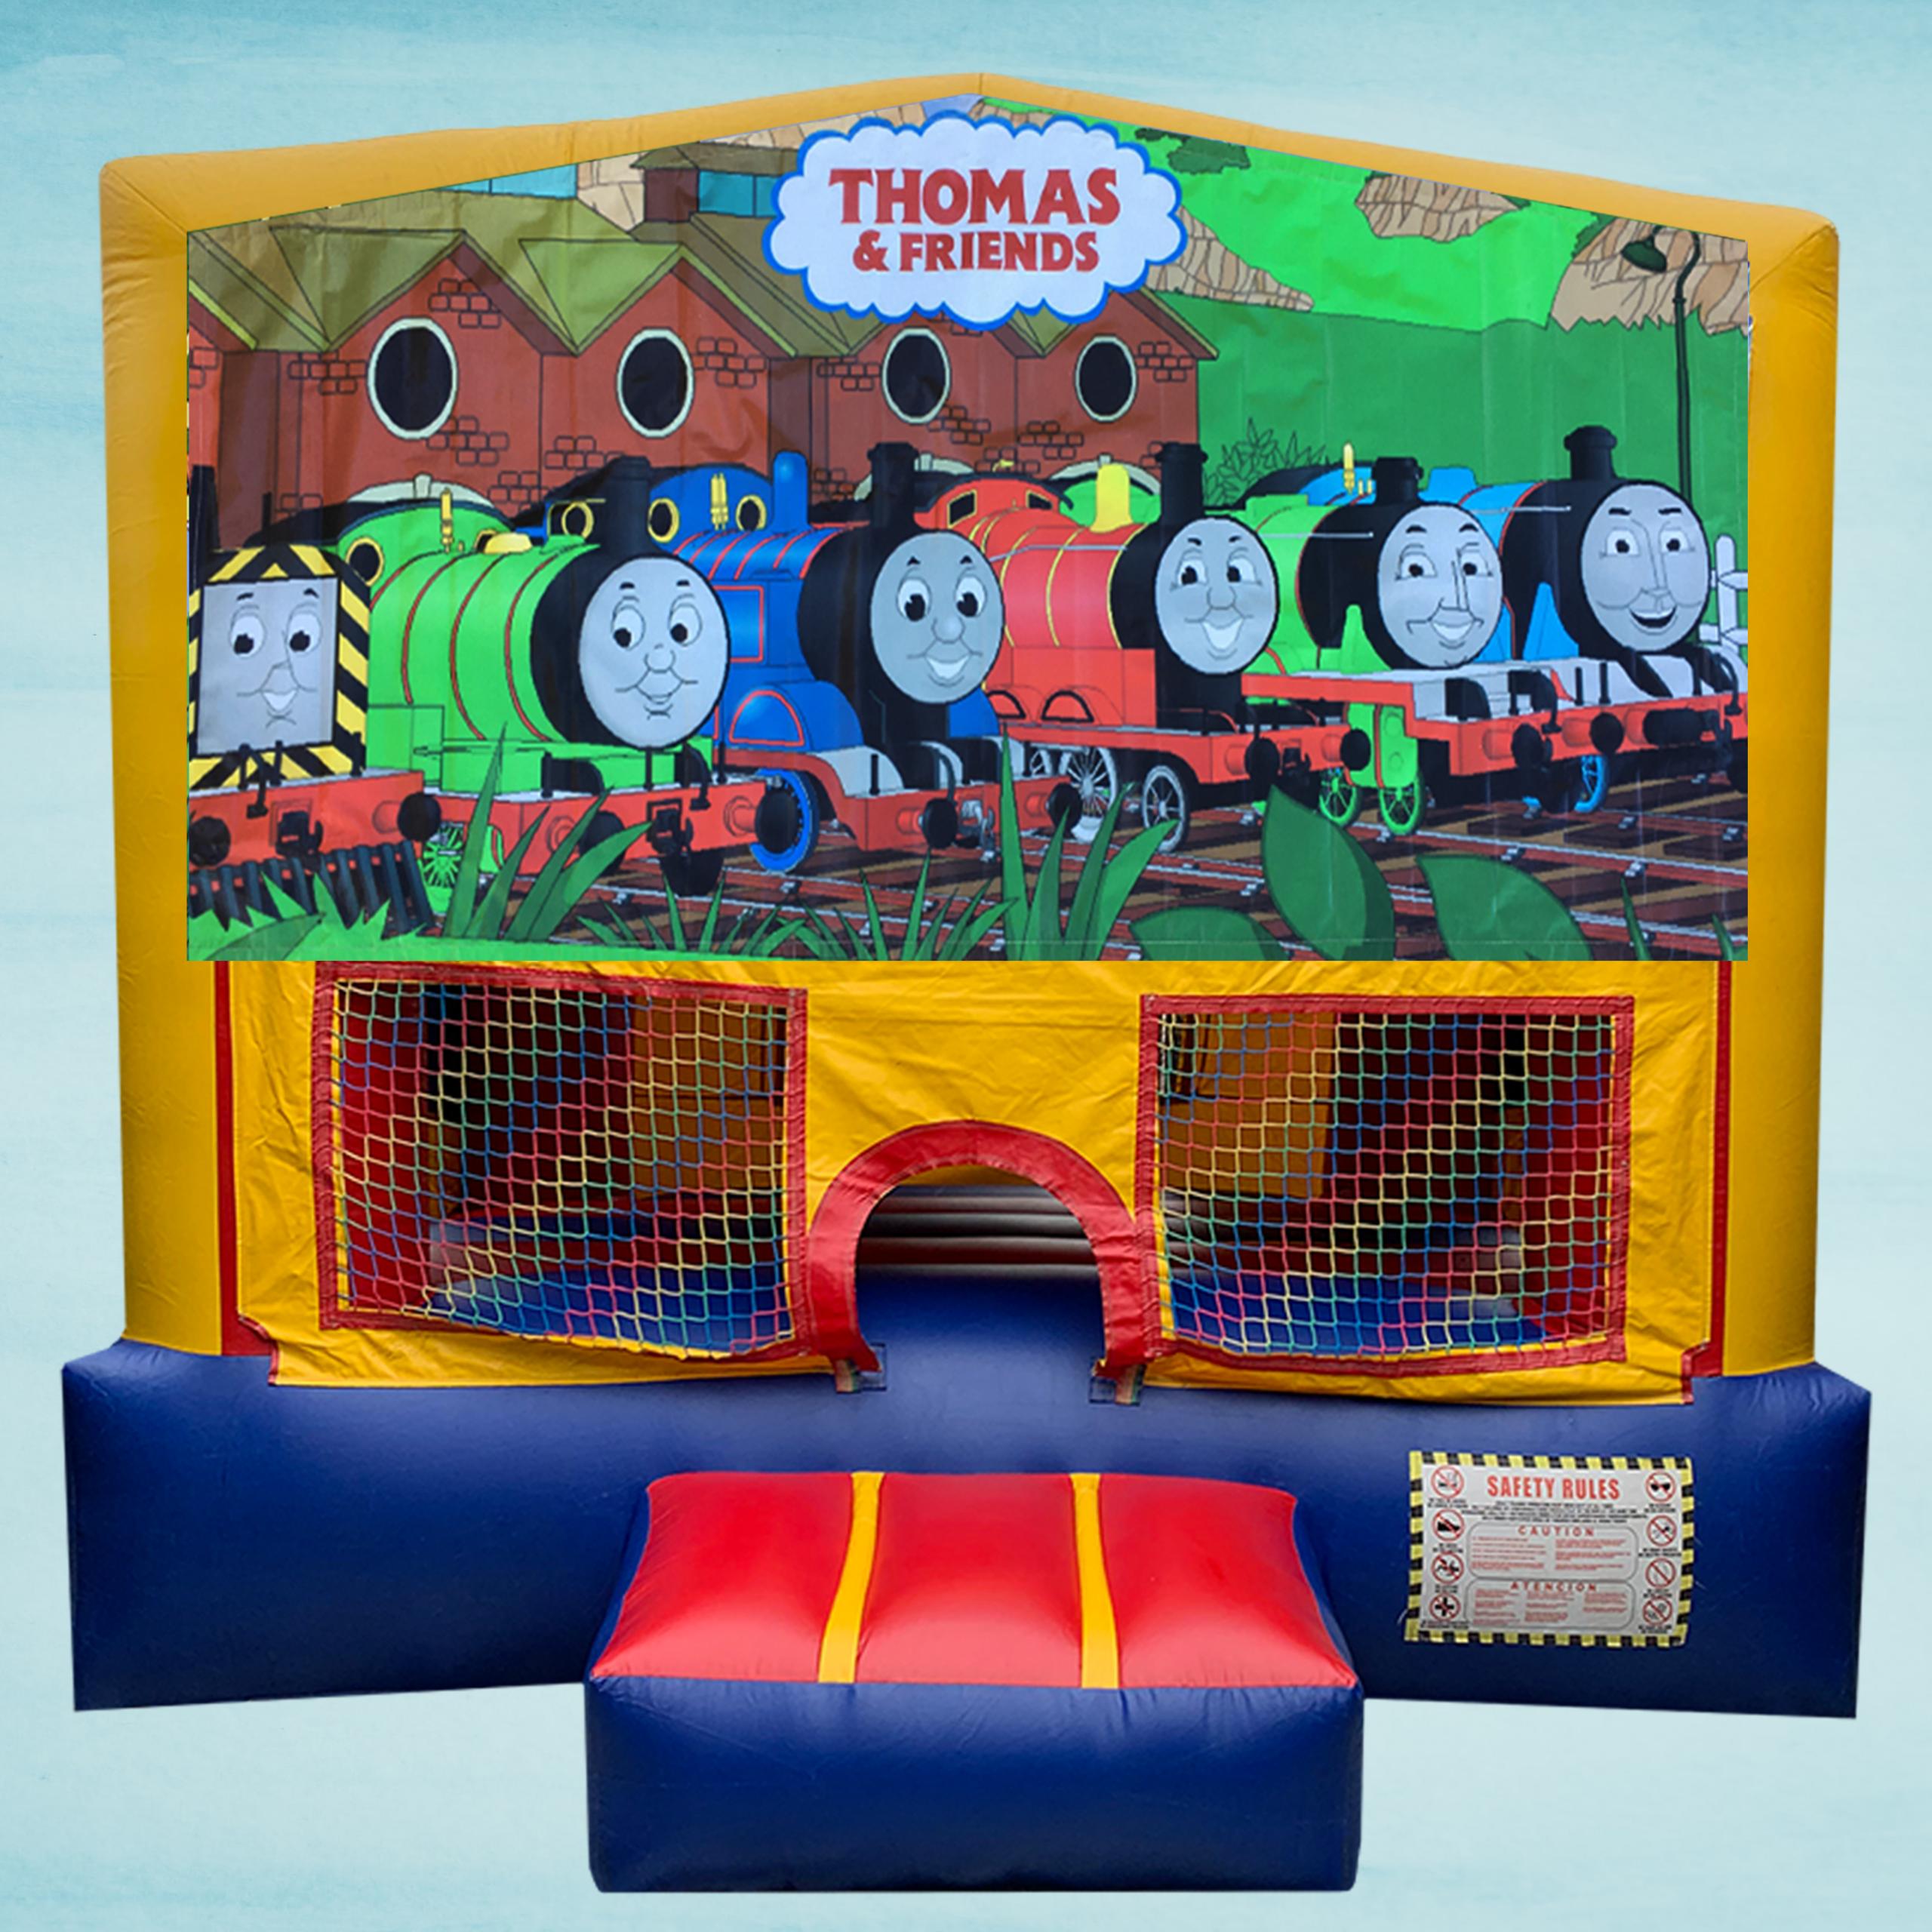 Thomas & Friends Bounce House